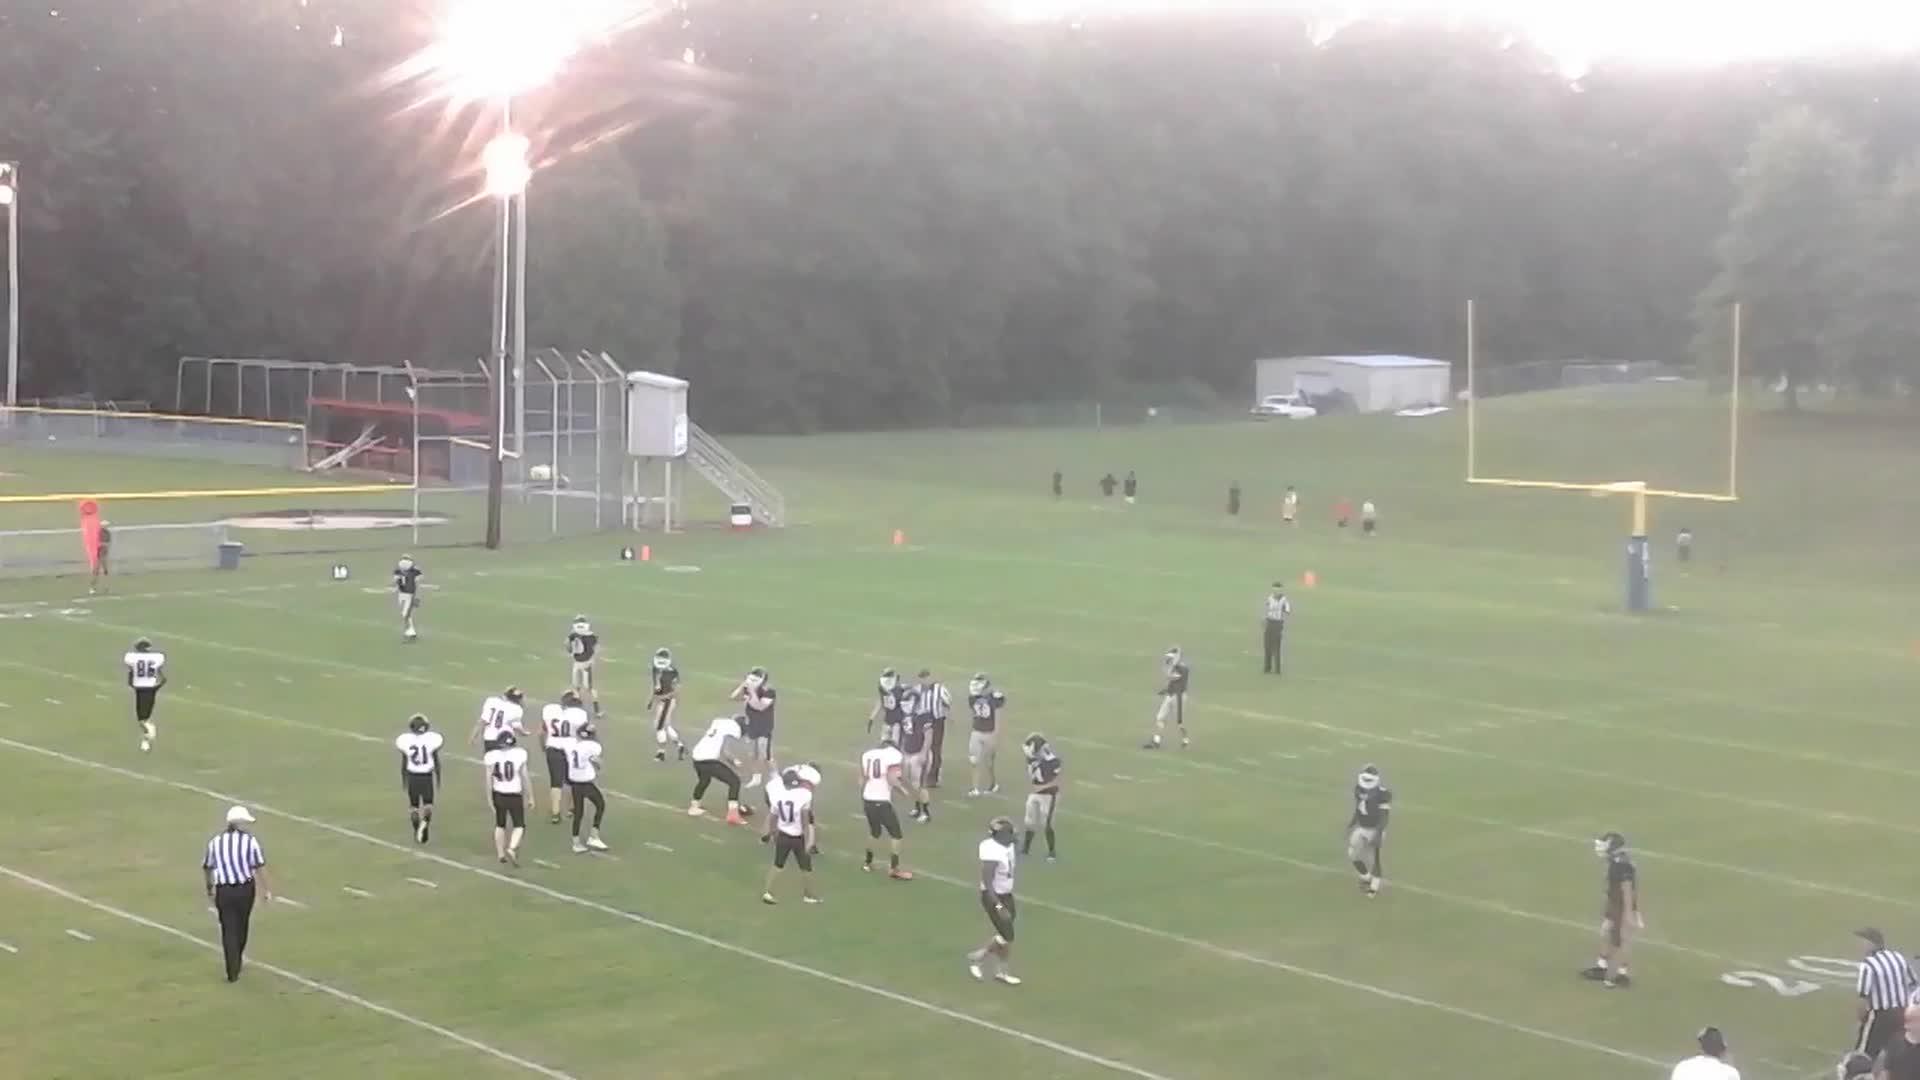 Tennessee fayette county rossville - Rossville Academy Rossville Christian Academy High School Rossville Tennessee Football Hudl